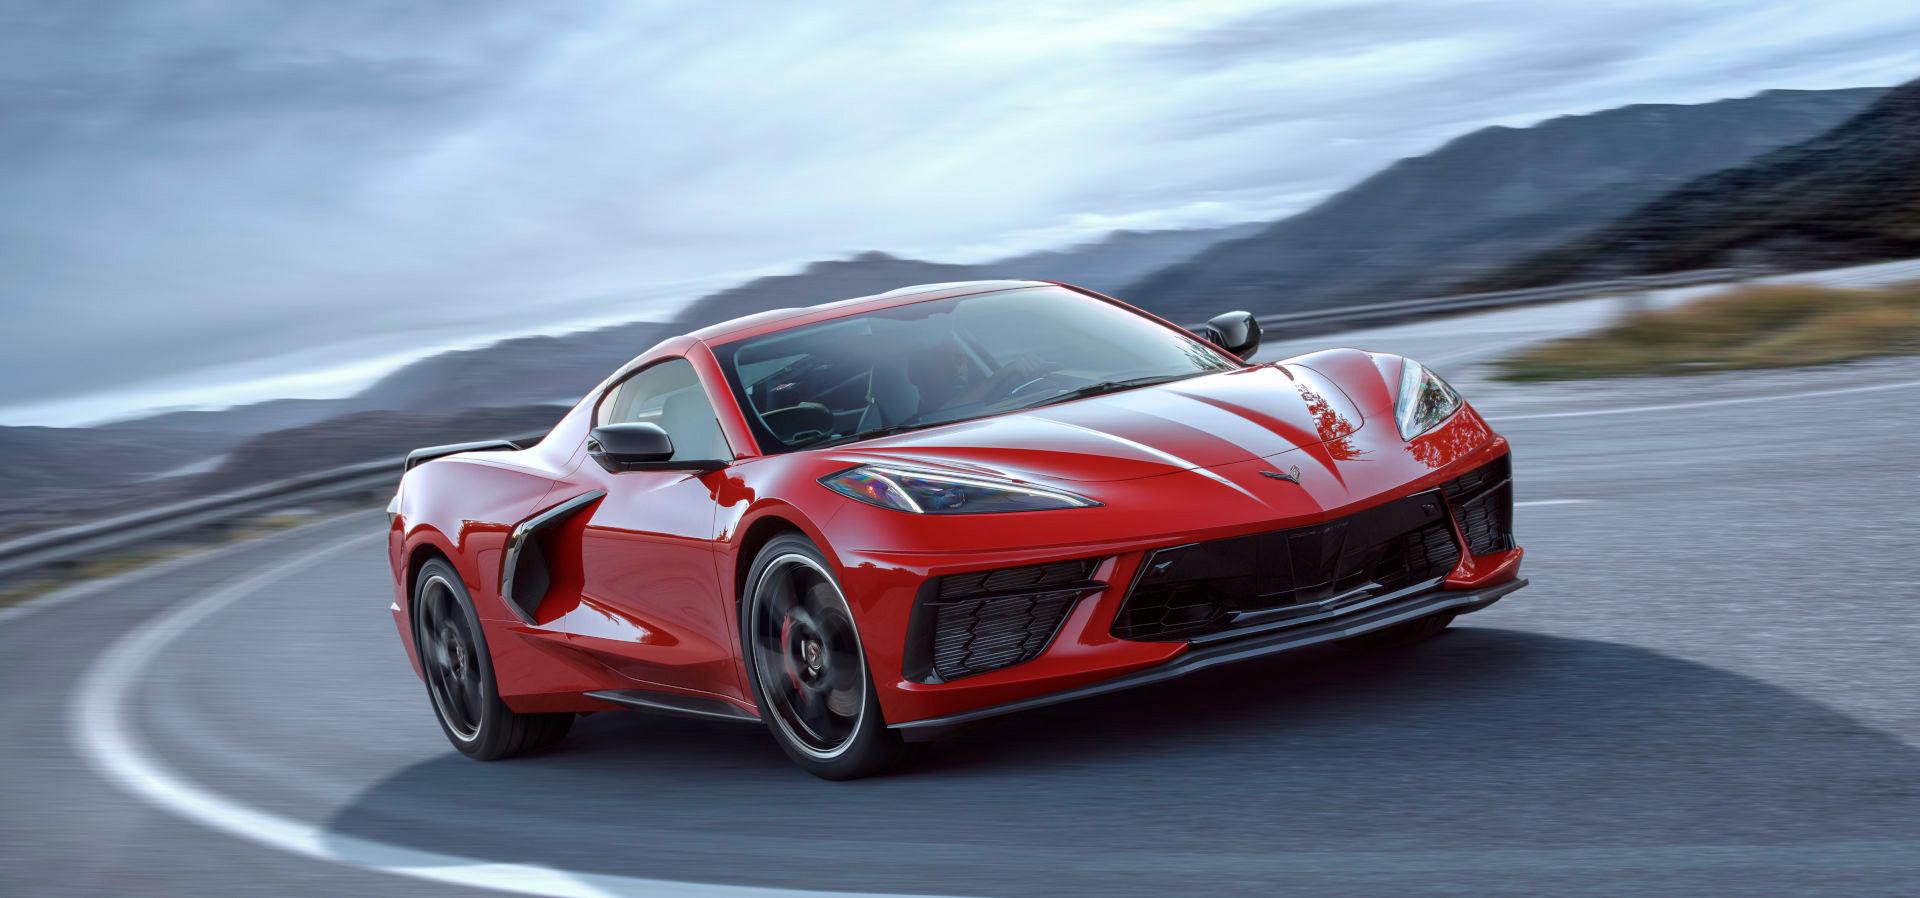 2020 Chevrolet Corvette, el deportivo americano se pasa al motor central